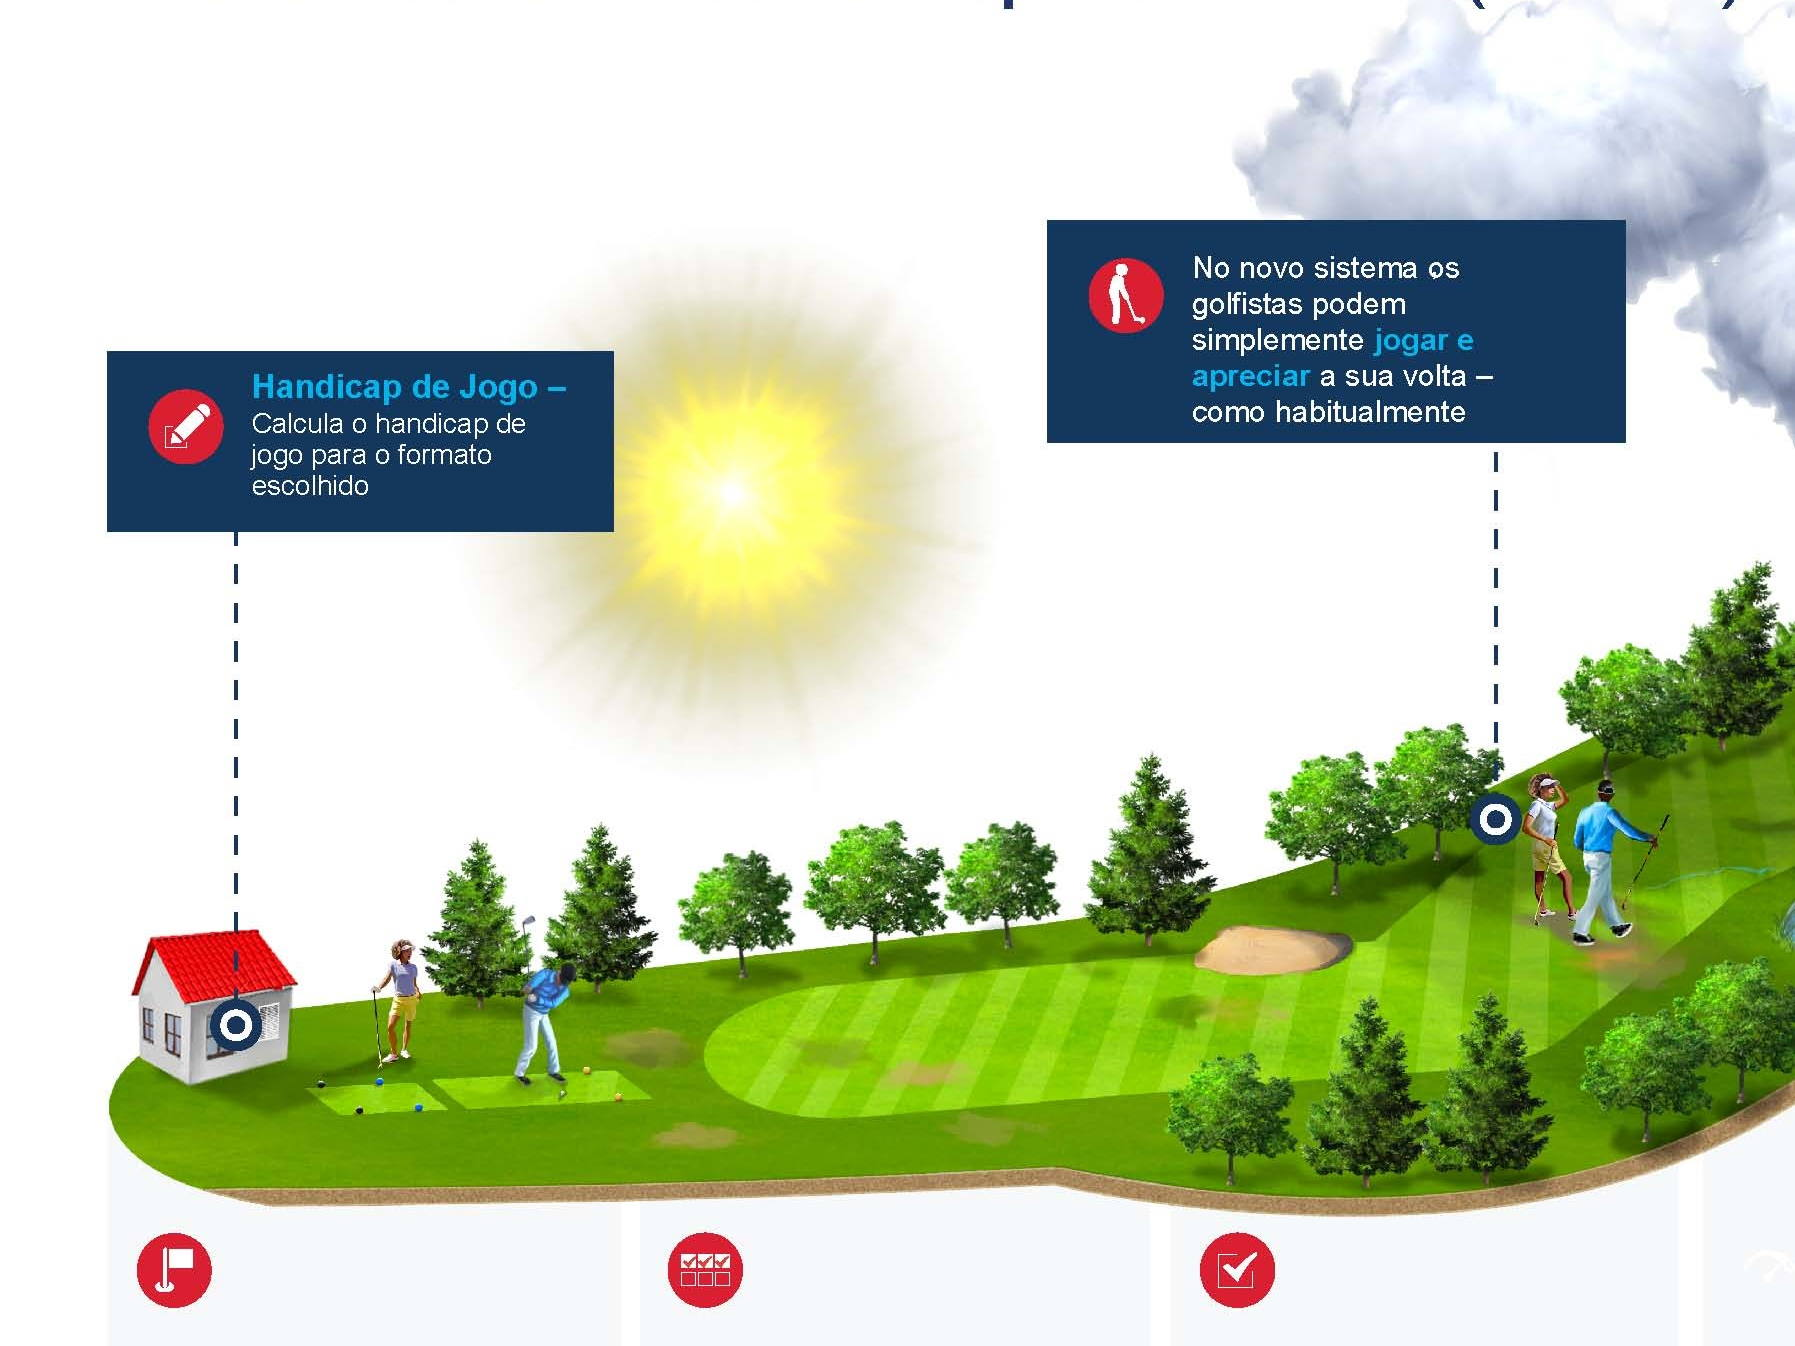 ACP-Noticias-Golfe-Sistema-de-Handicap-Mundial-WHS-detalhe